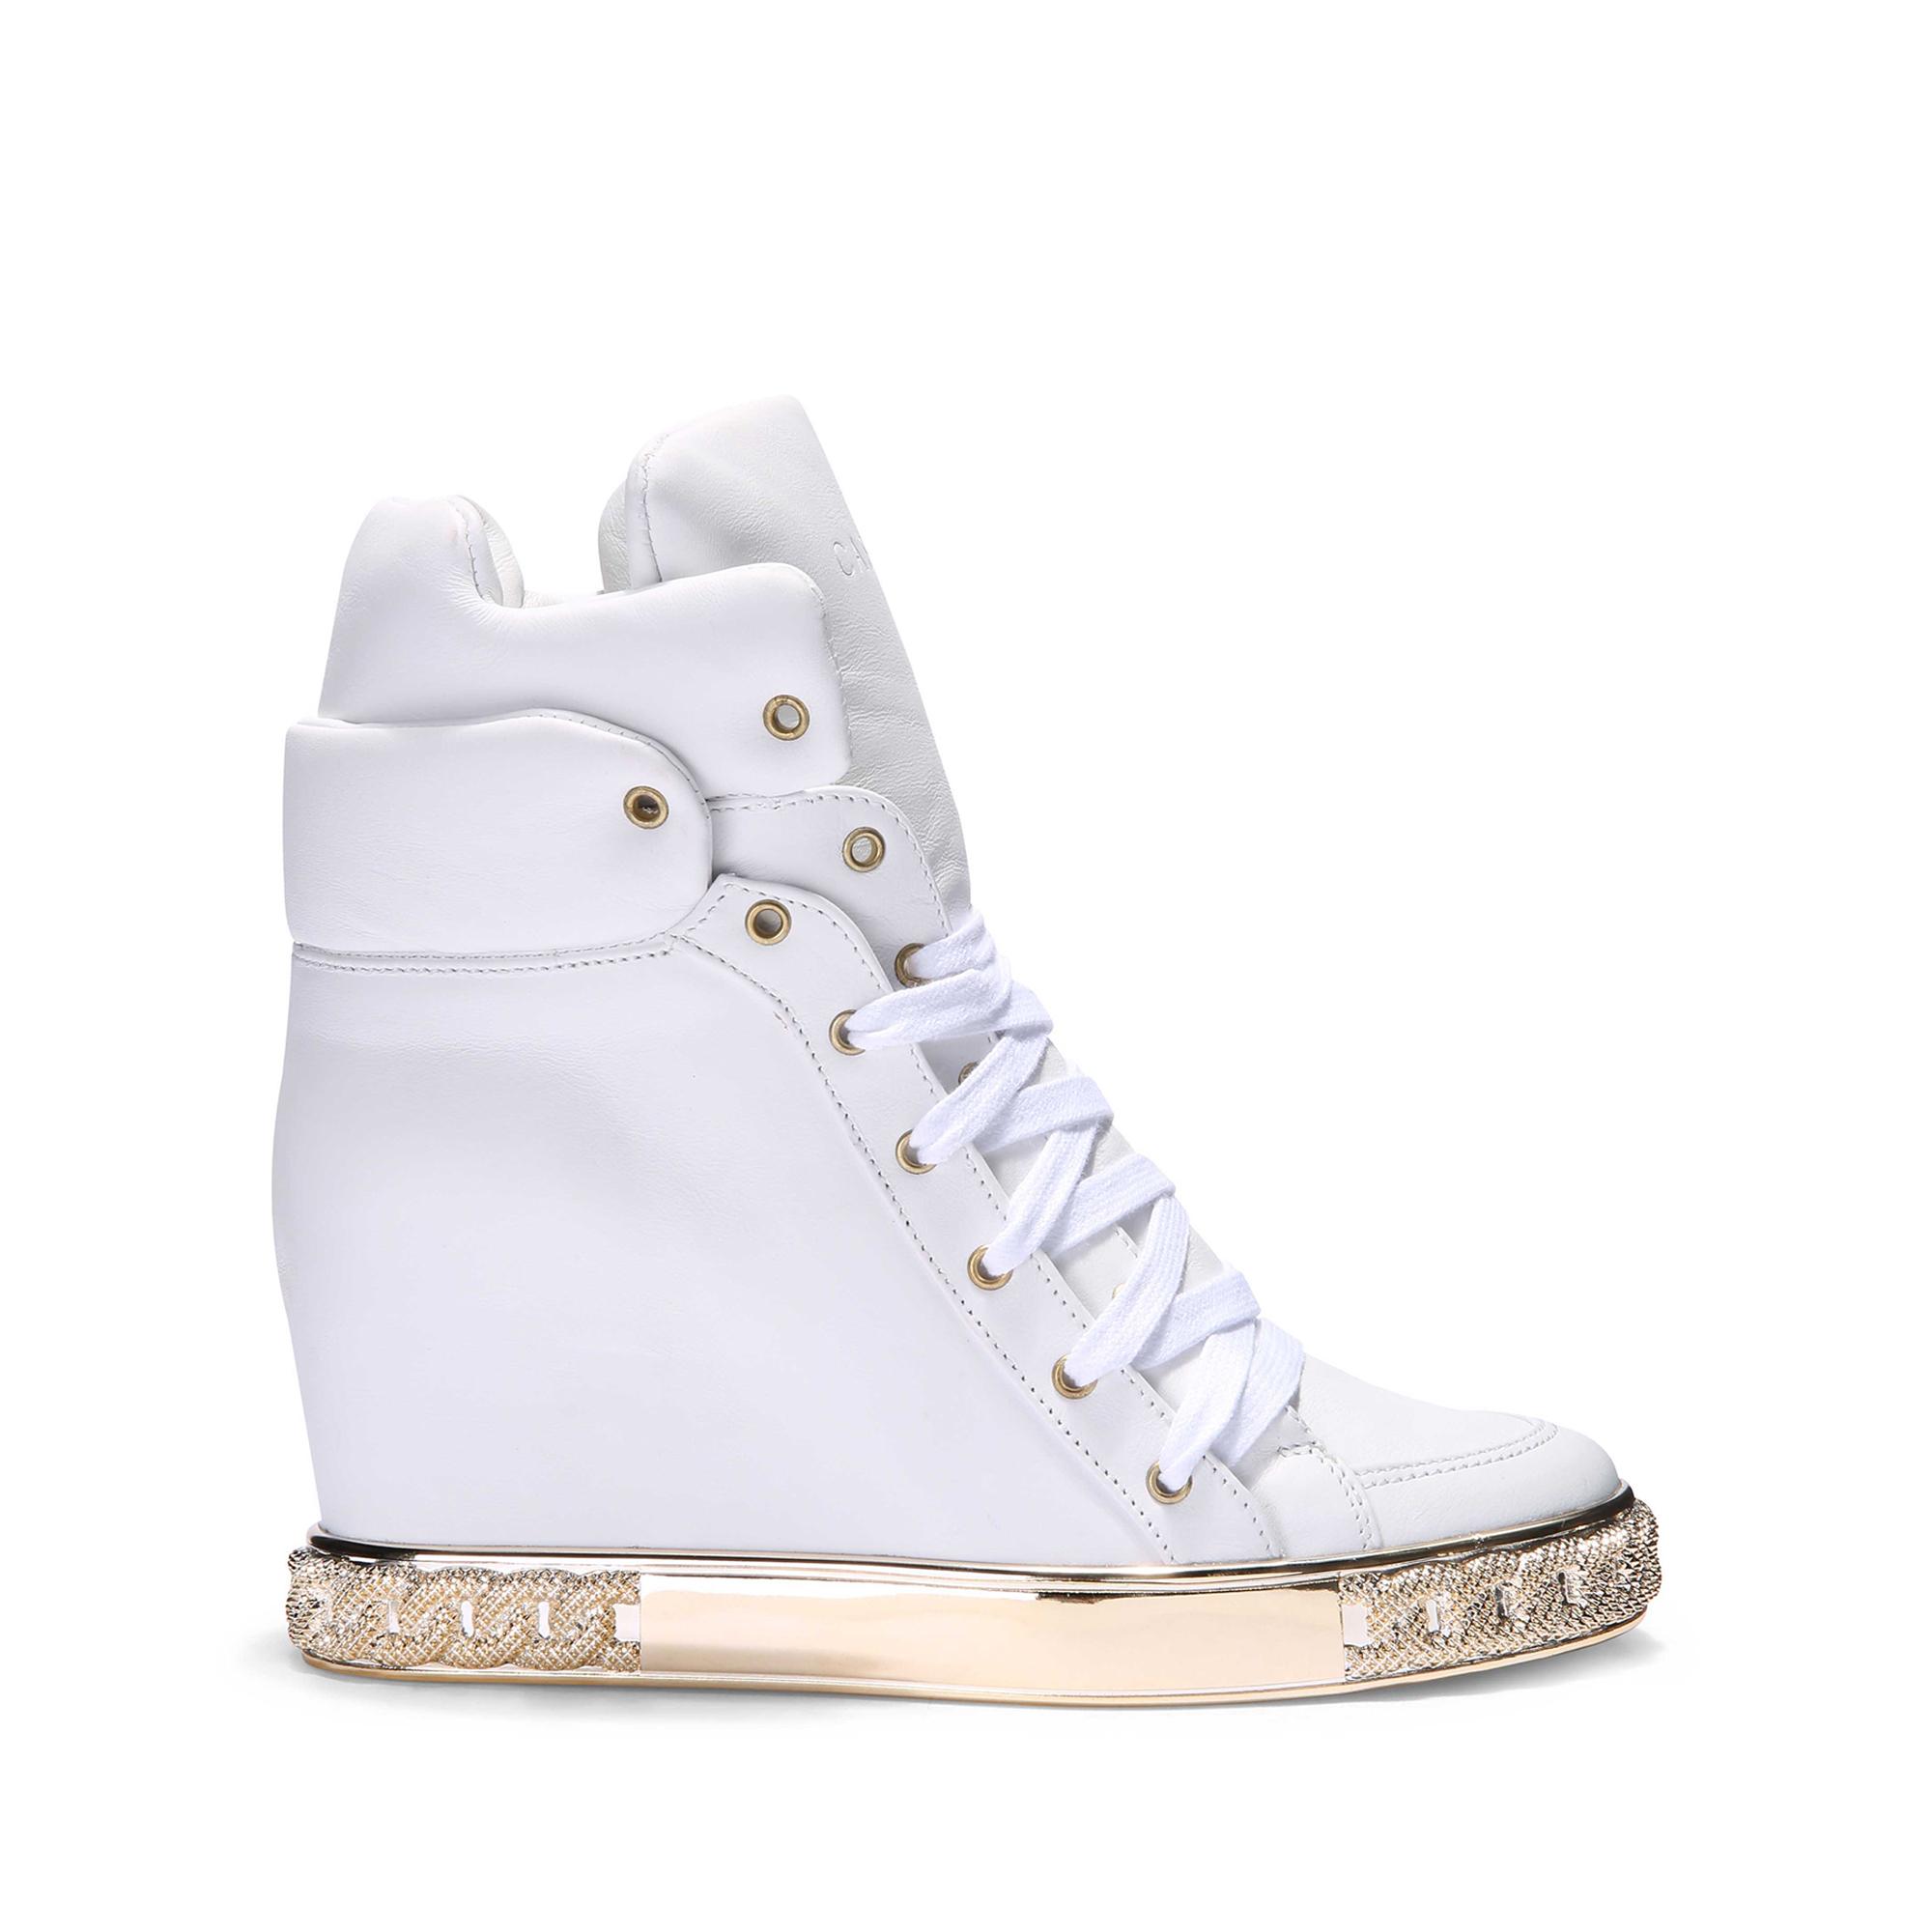 238dacef08f Lyst - Casadei Sneaker in White